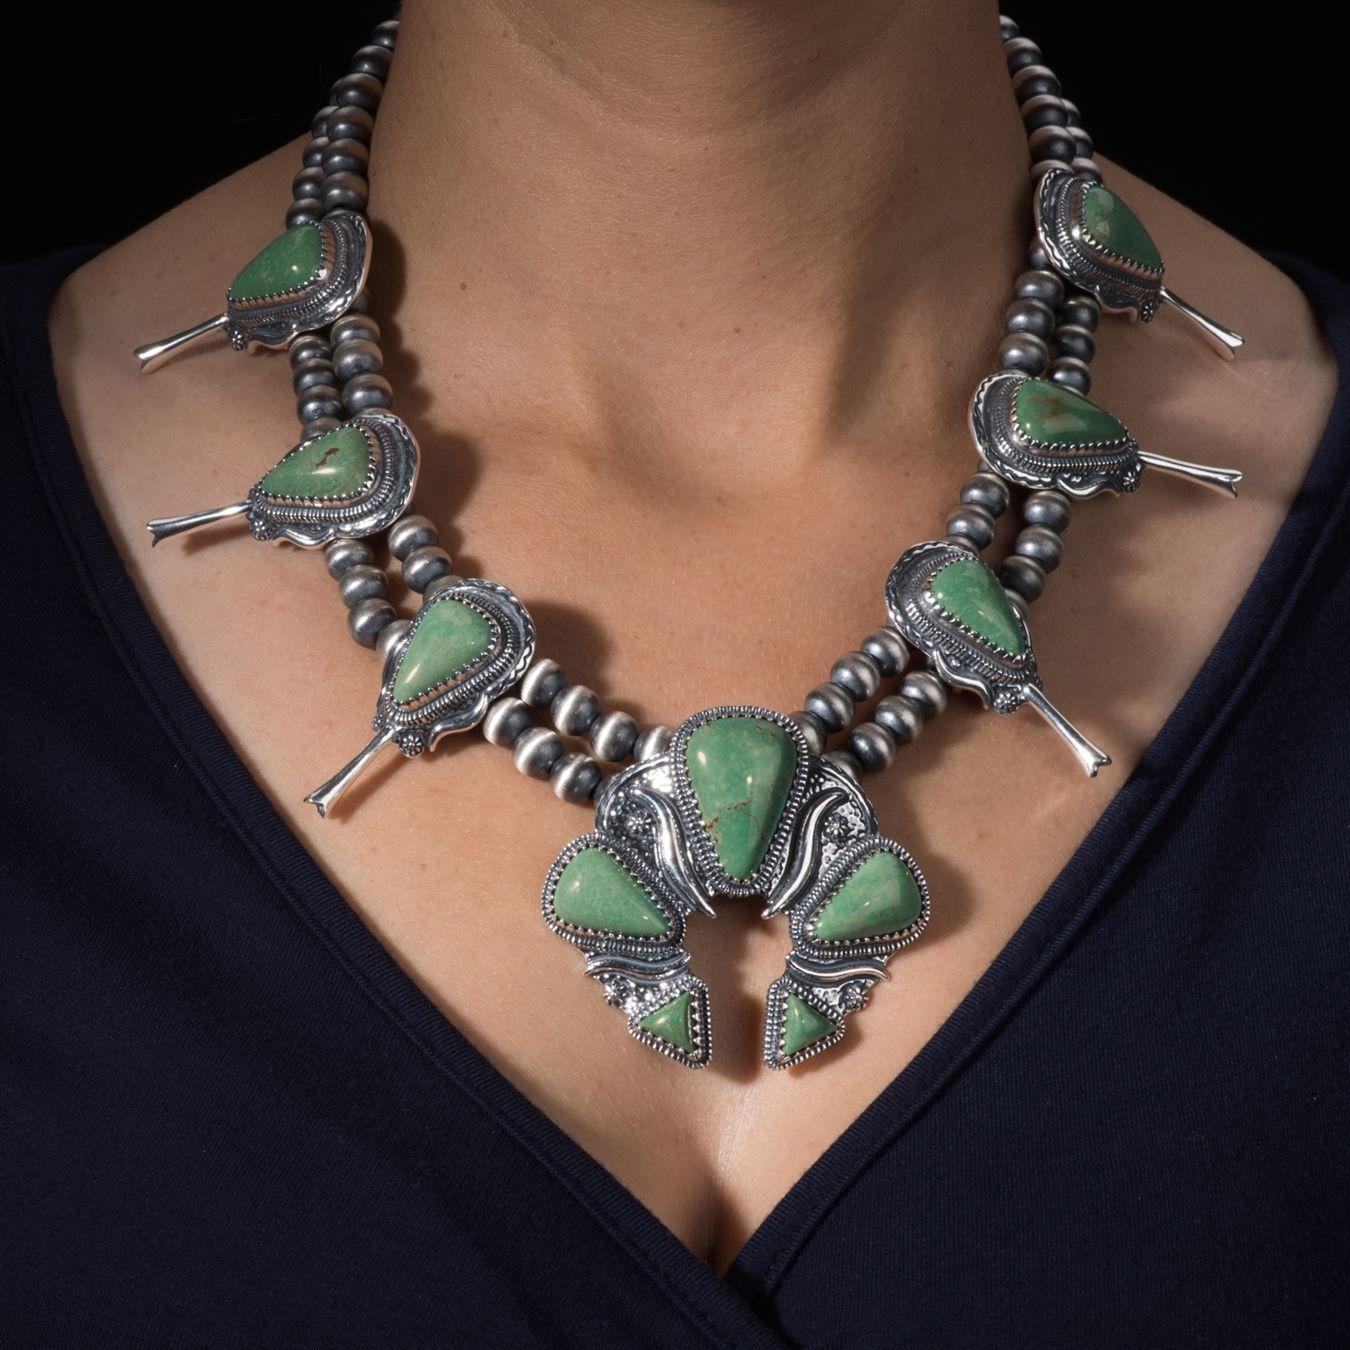 American West Jewelry Jennifer Nettles Squash Blossom